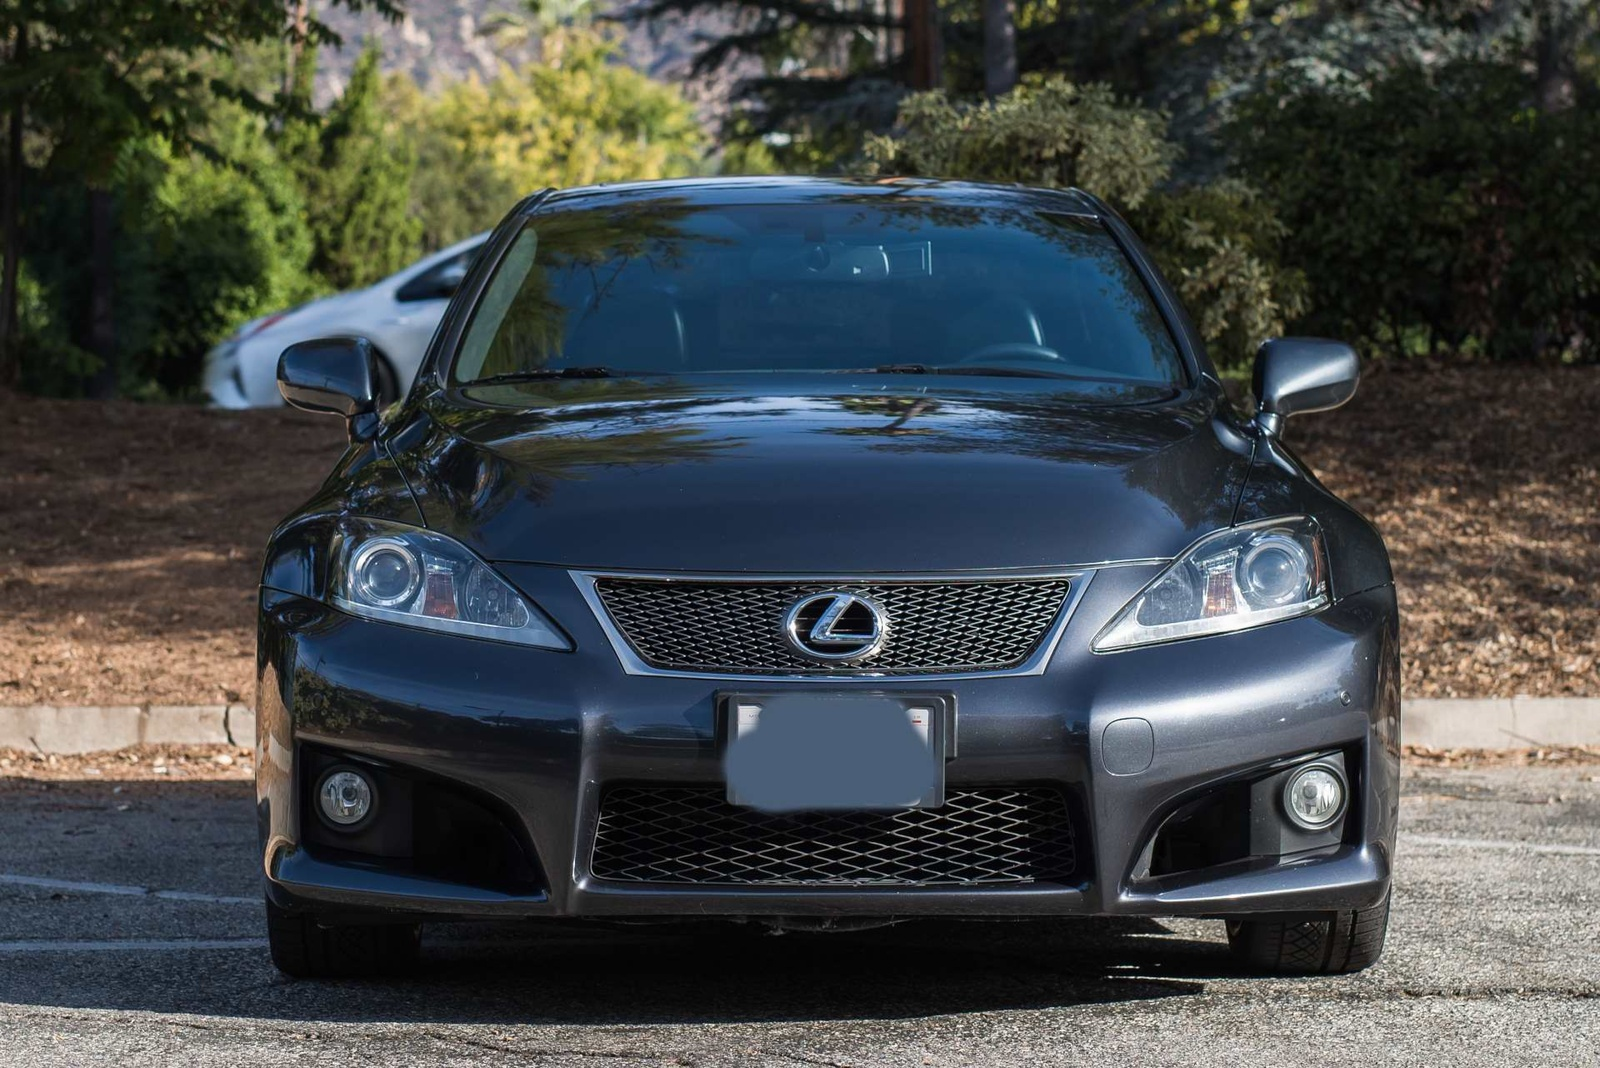 2011 Lexus IS F - Overview - CarGurus